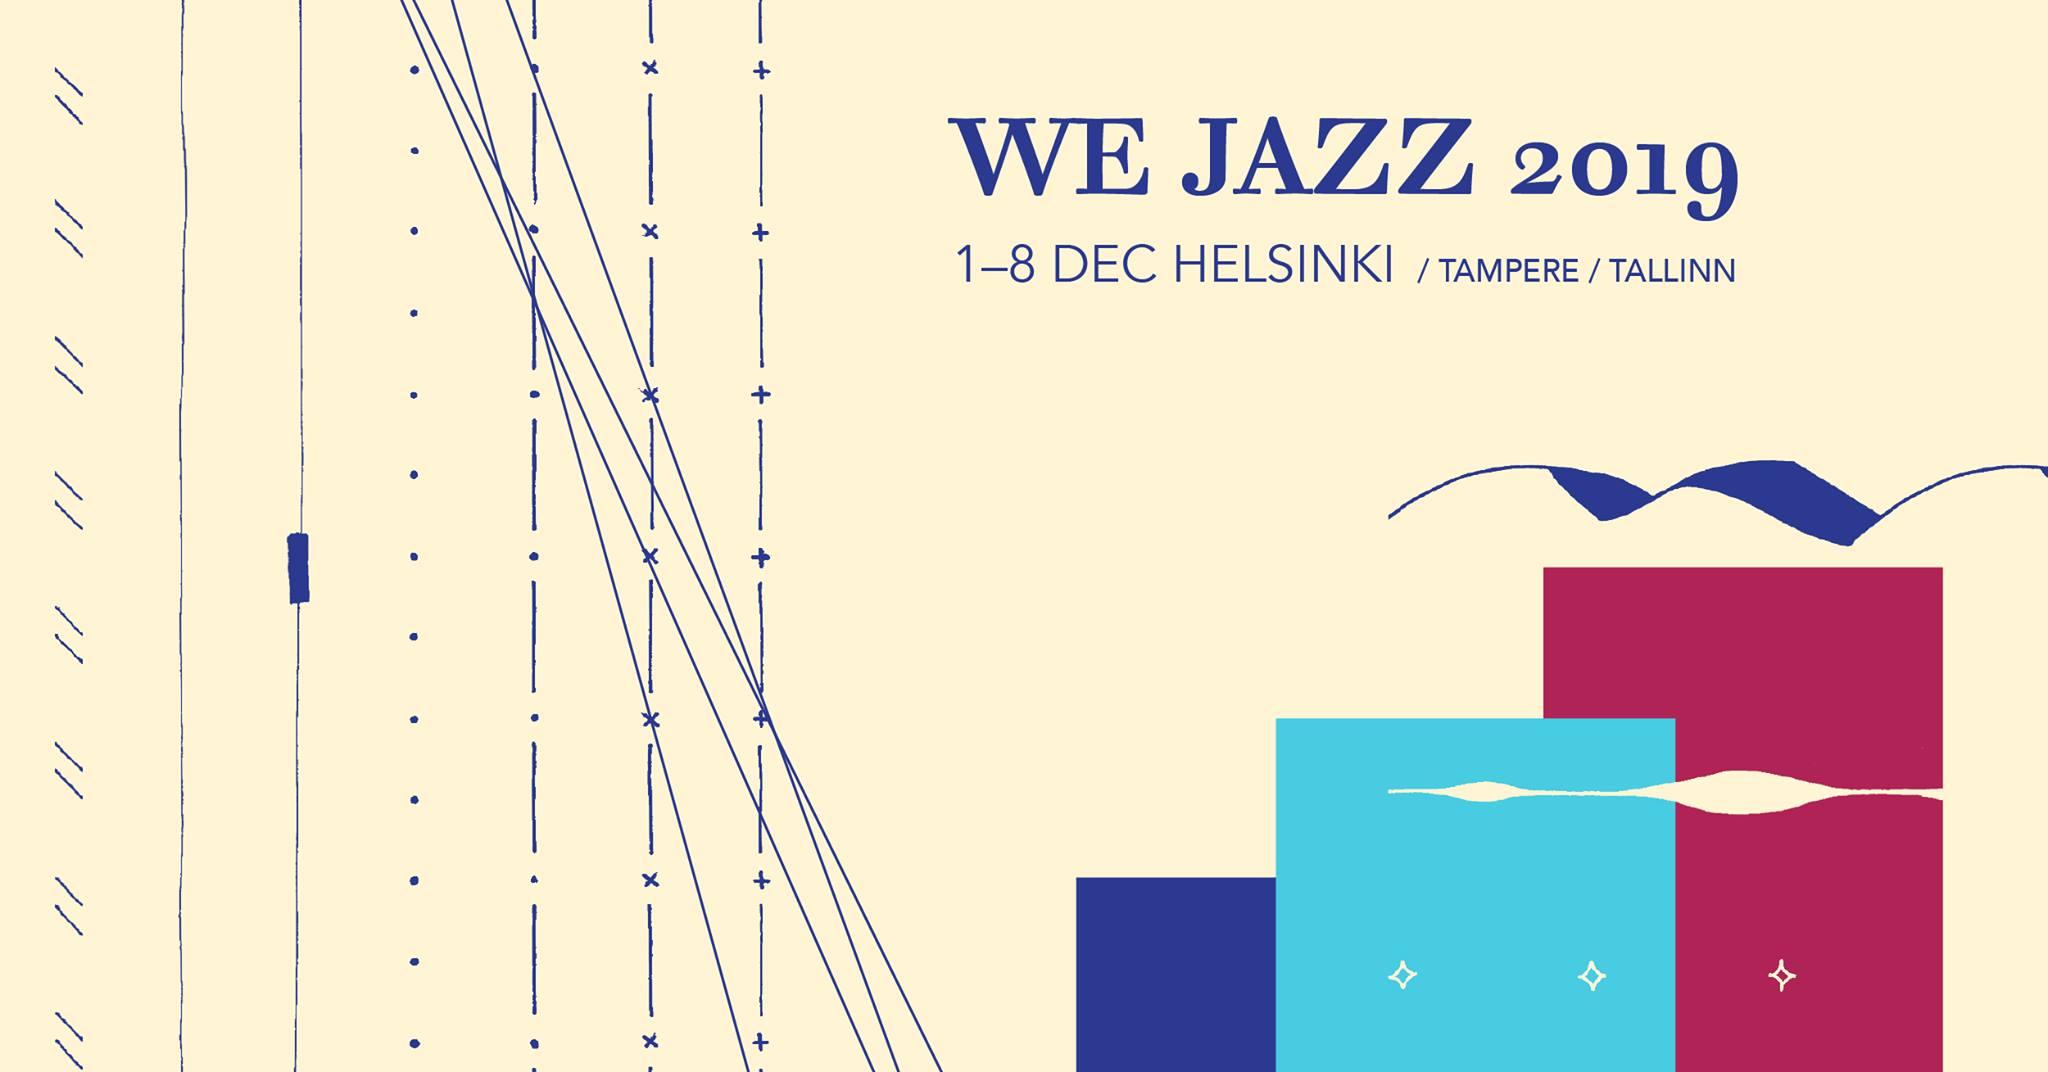 Link to event We Jazz: Katu Kaiku, Terkel Norgaard with Ralph Alessi, Timo Lassy & Teppo Mäkynen